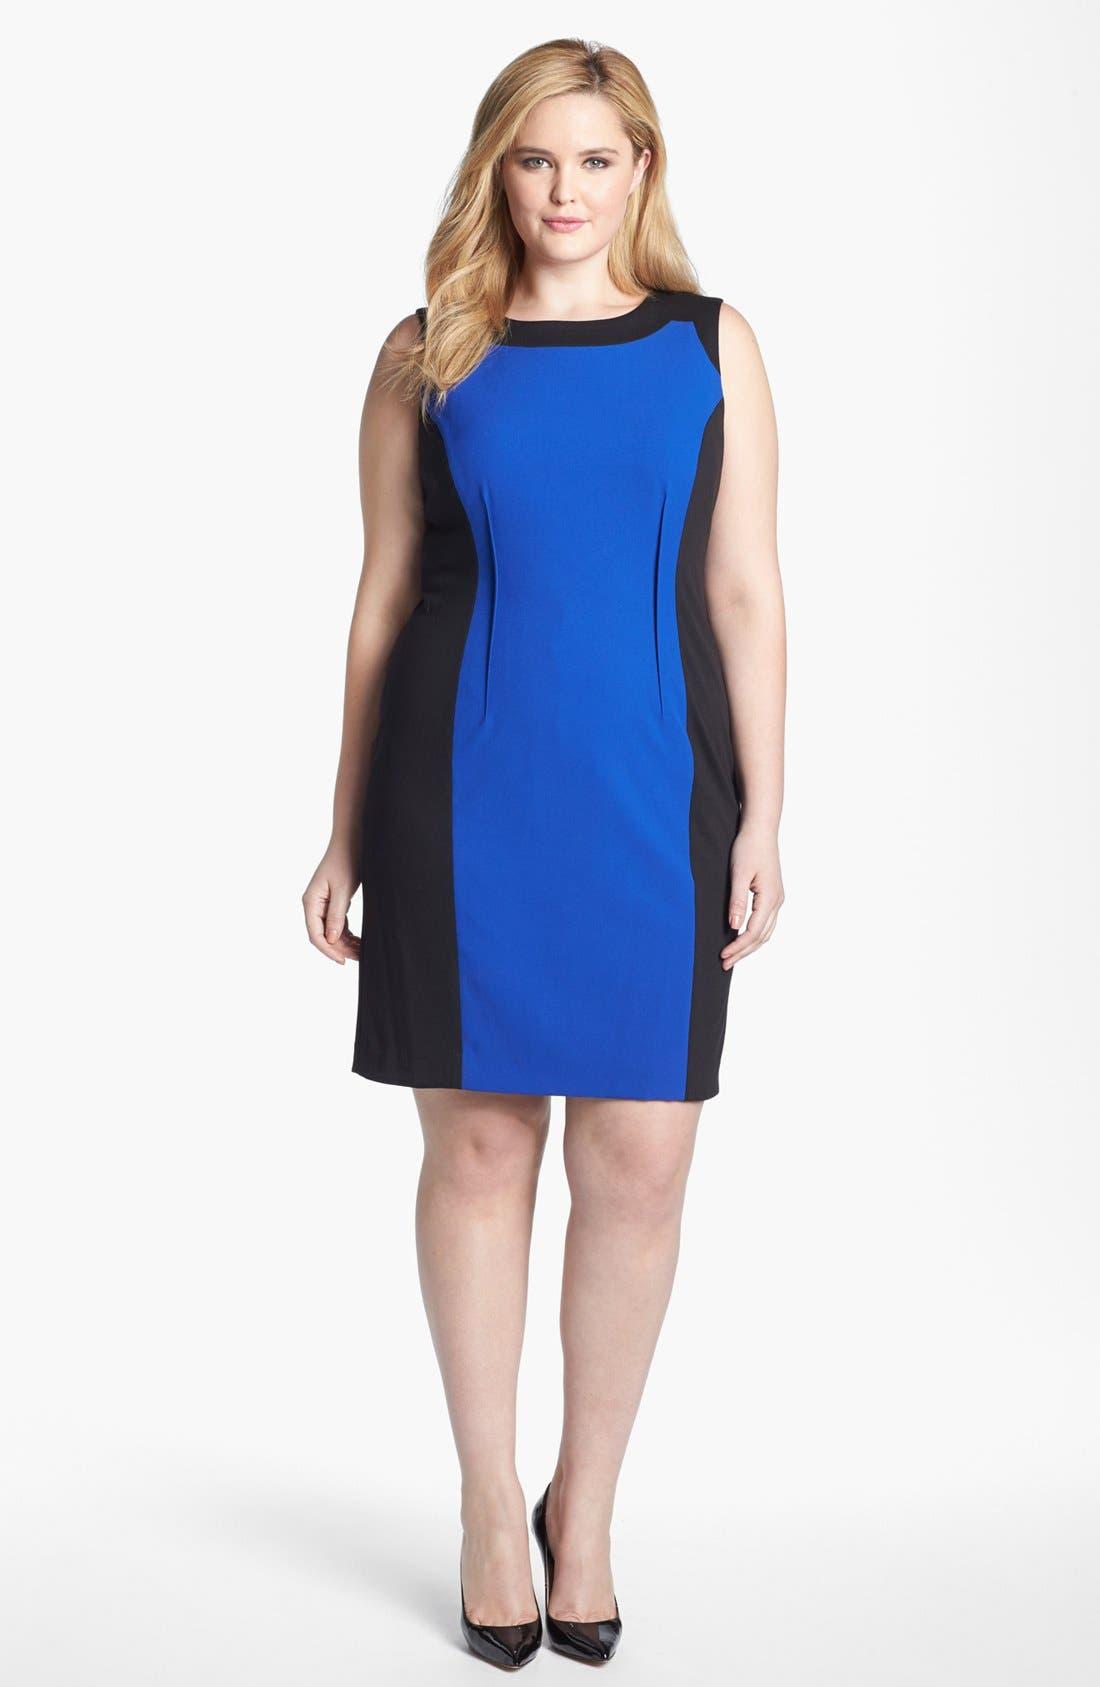 Main Image - Calvin Klein Sleeveless Colorblock Dress (Plus Size)